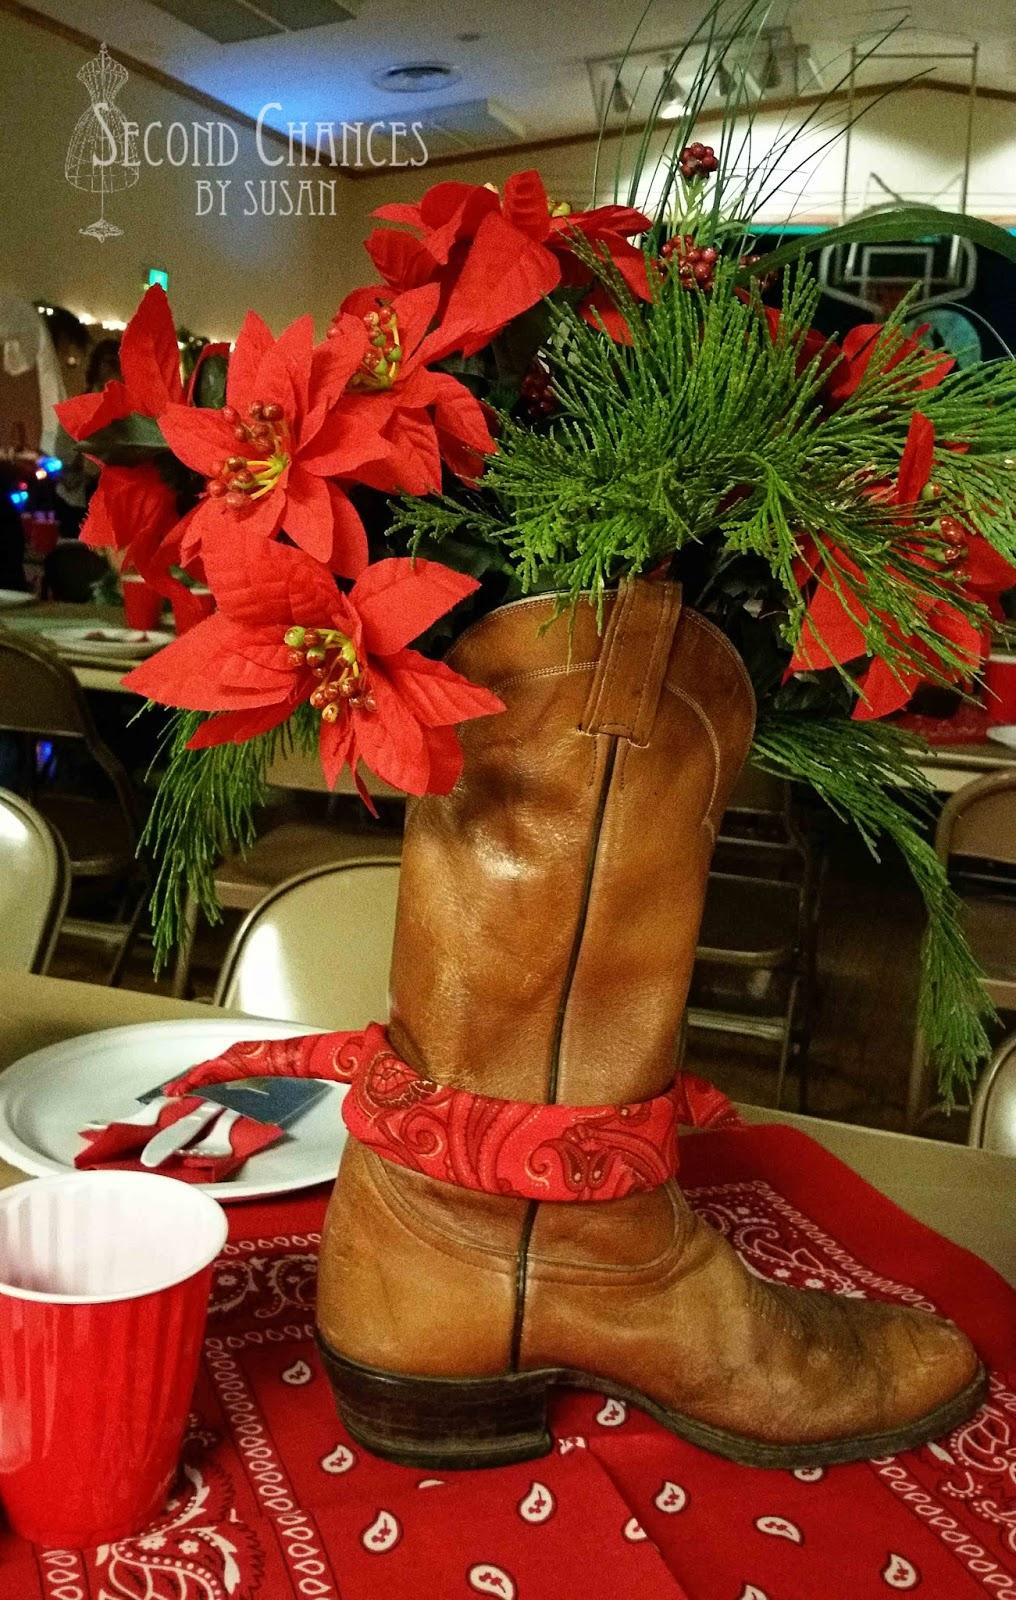 Second Chances By Susan A Cowboy Christmas